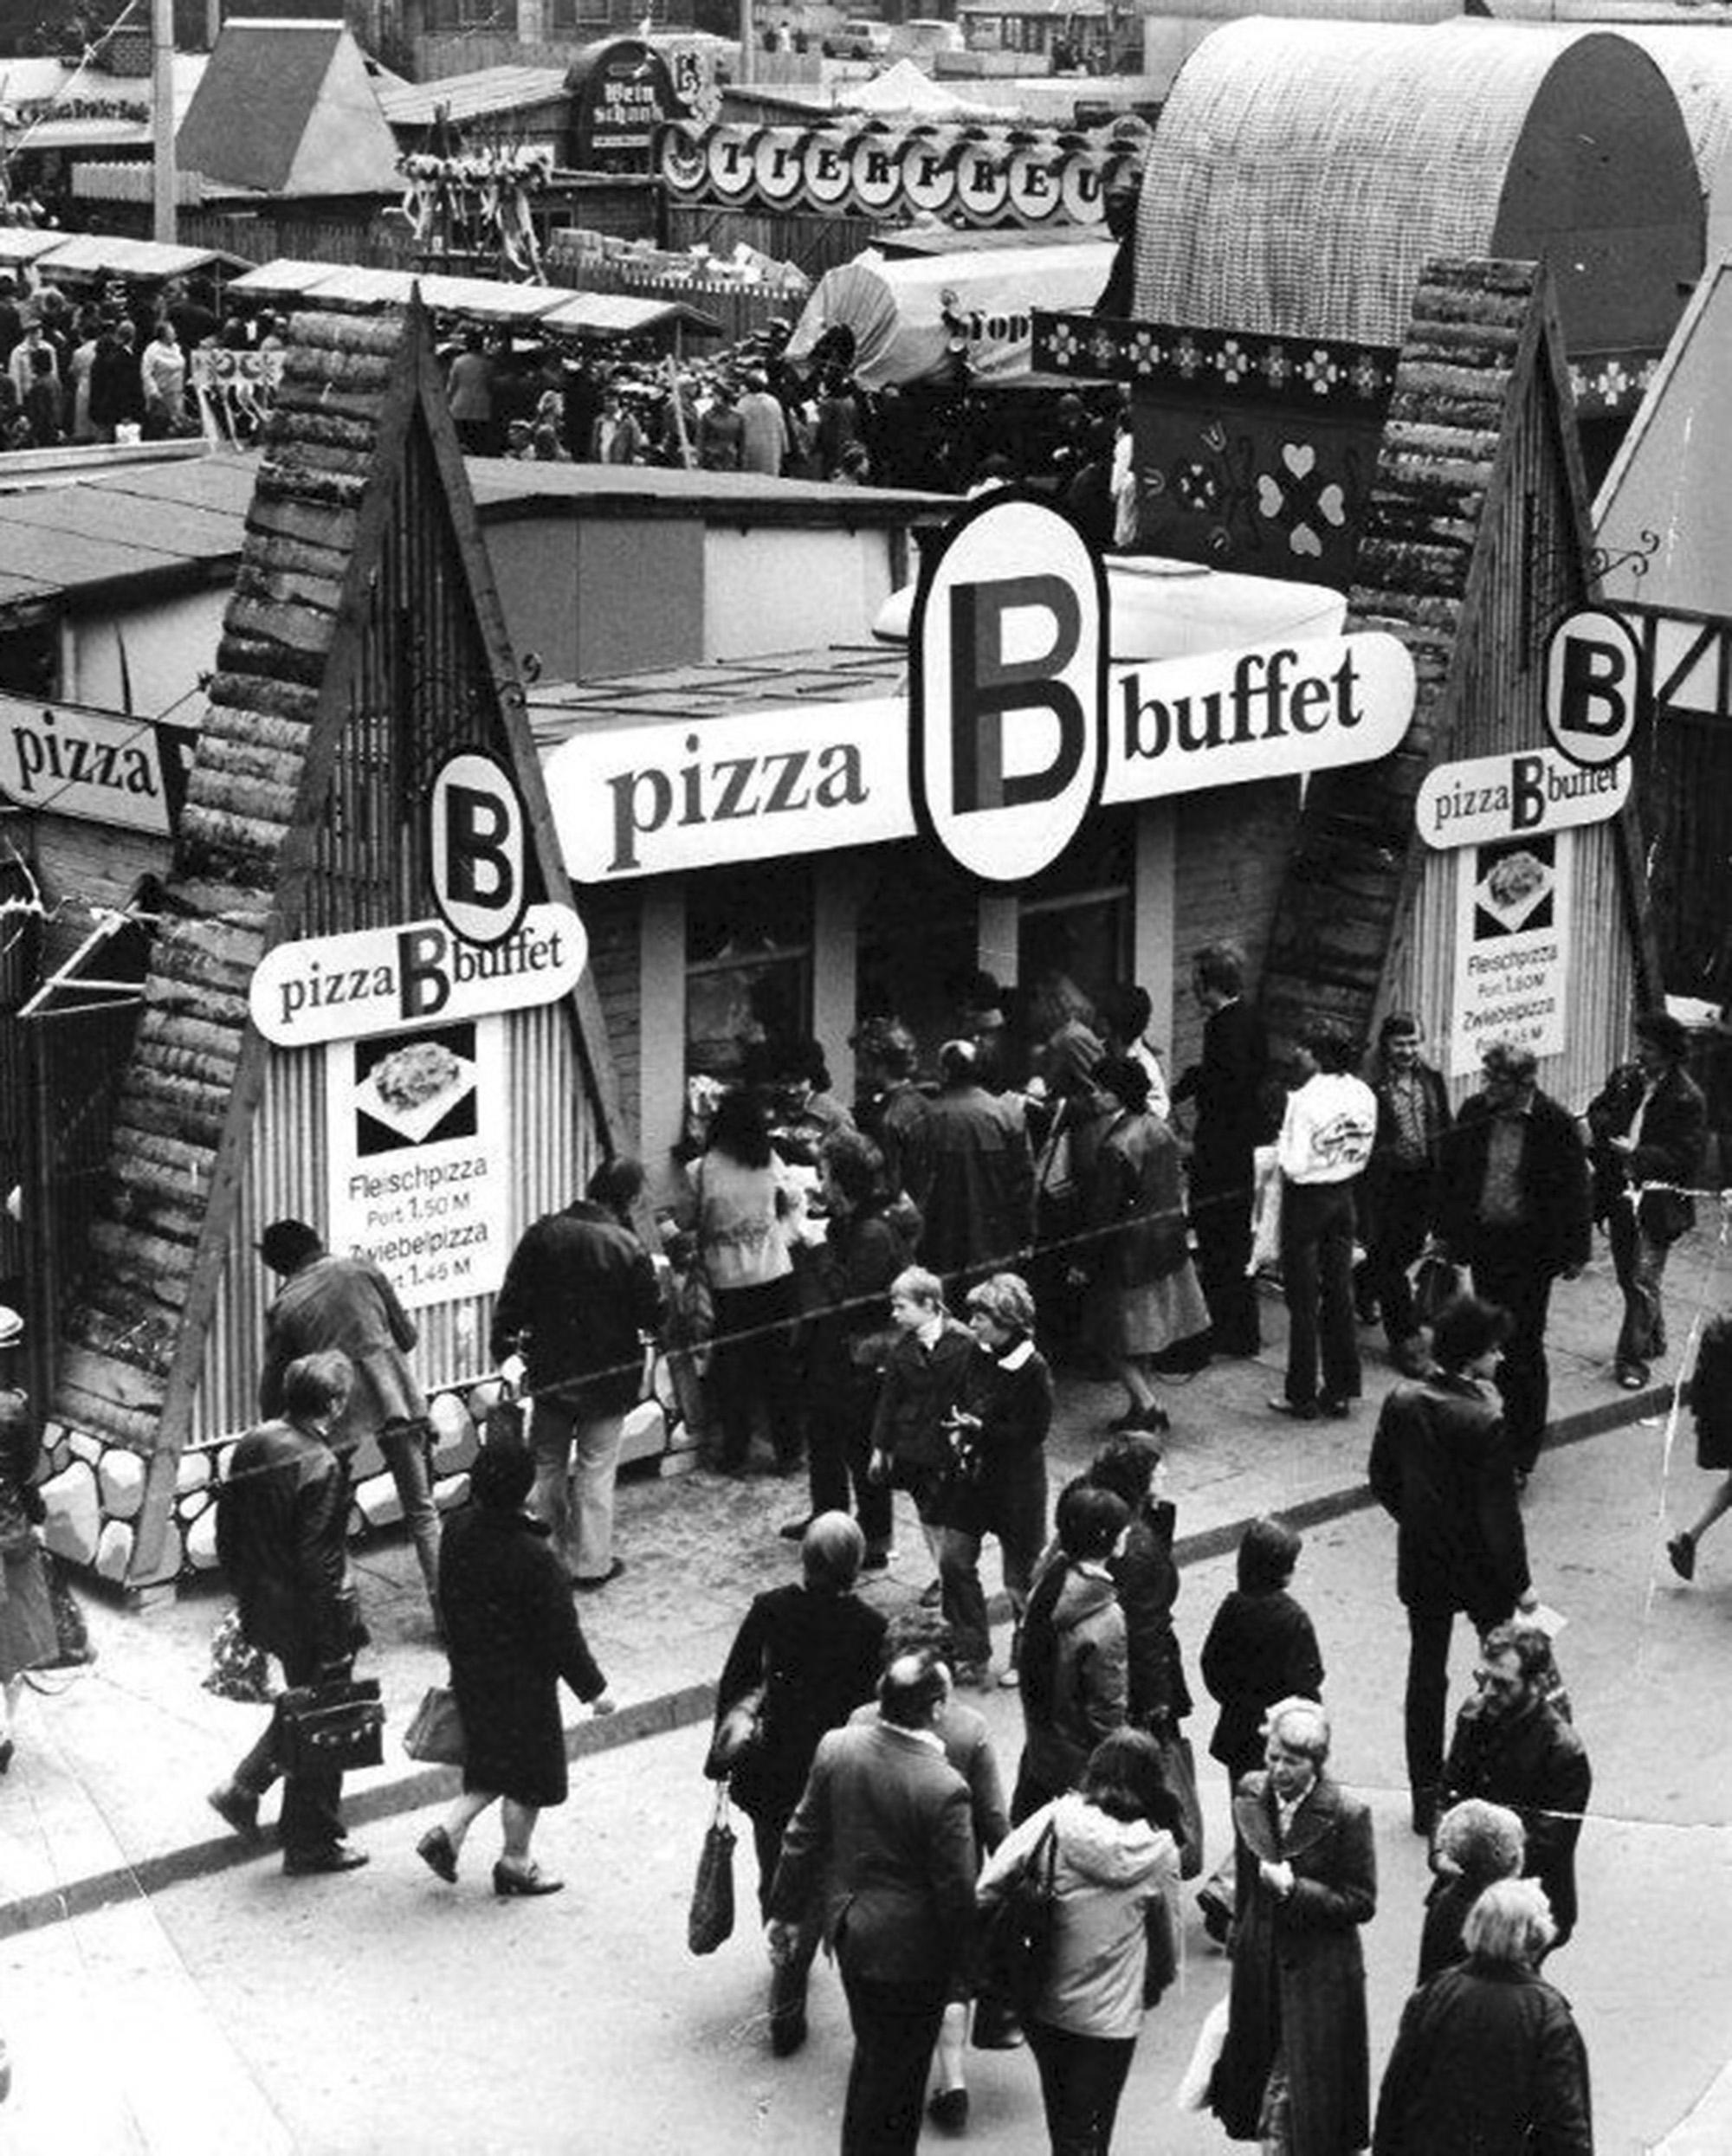 Pizza Buffet DDR